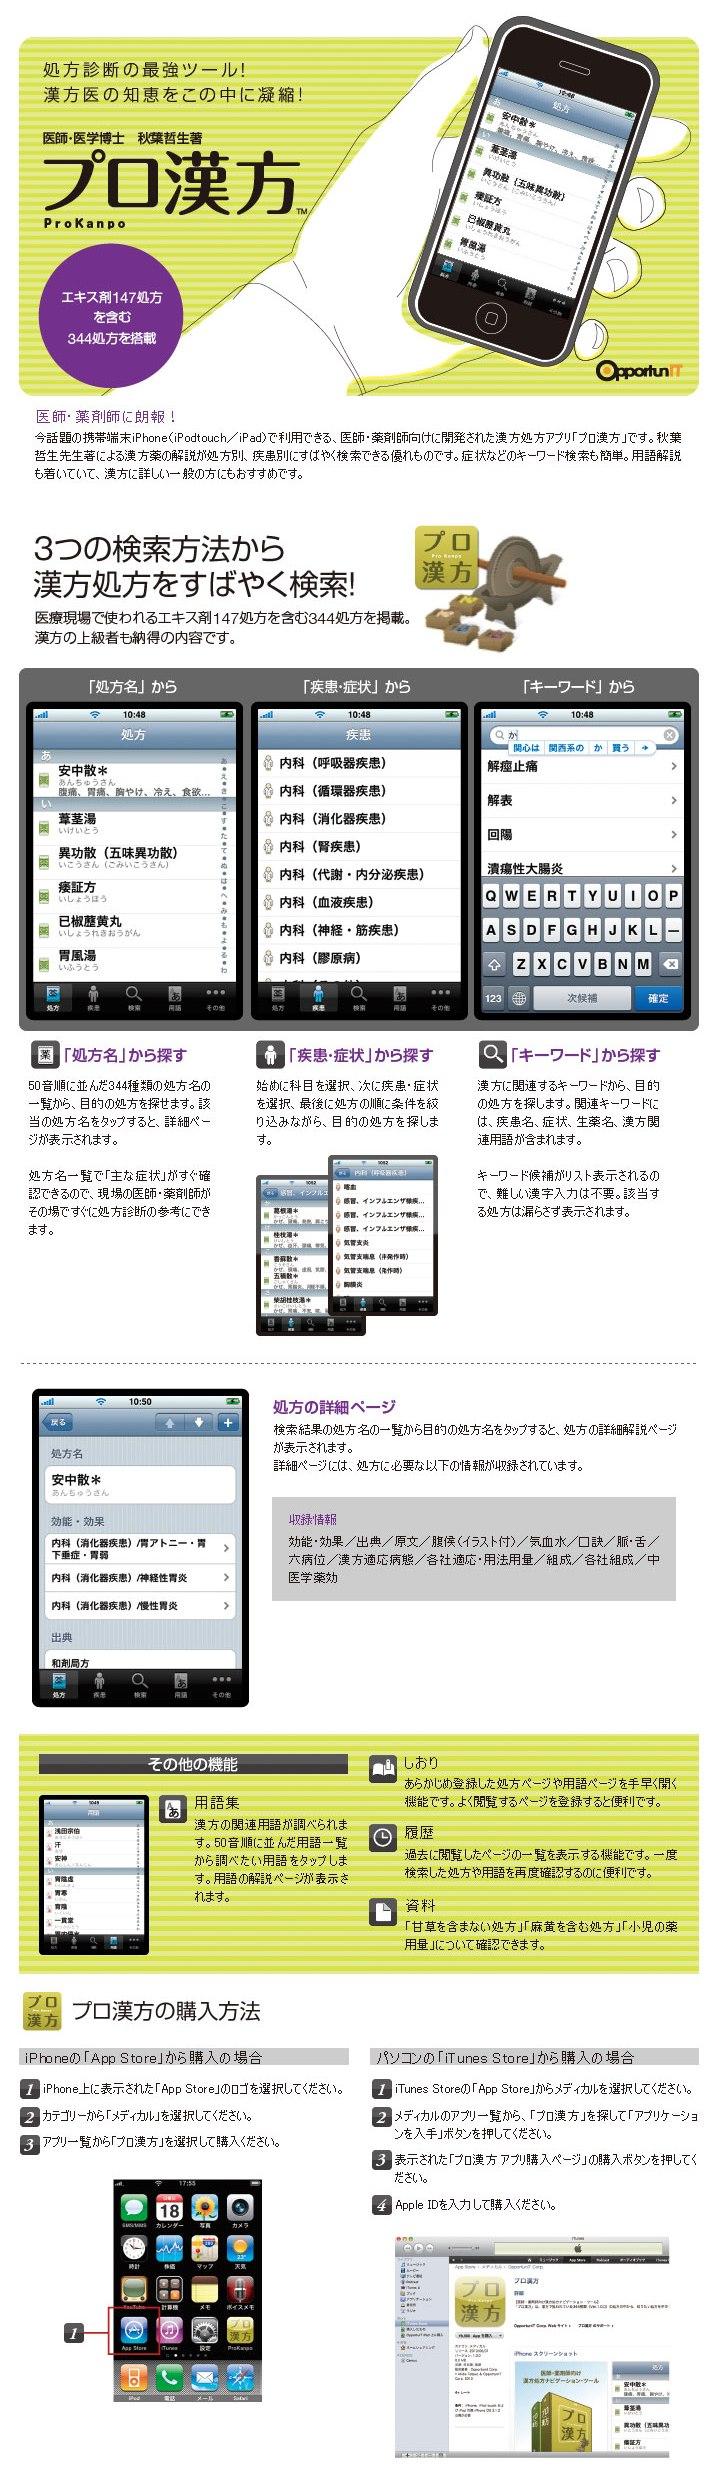 iphoneAppForWeb01a.jpg